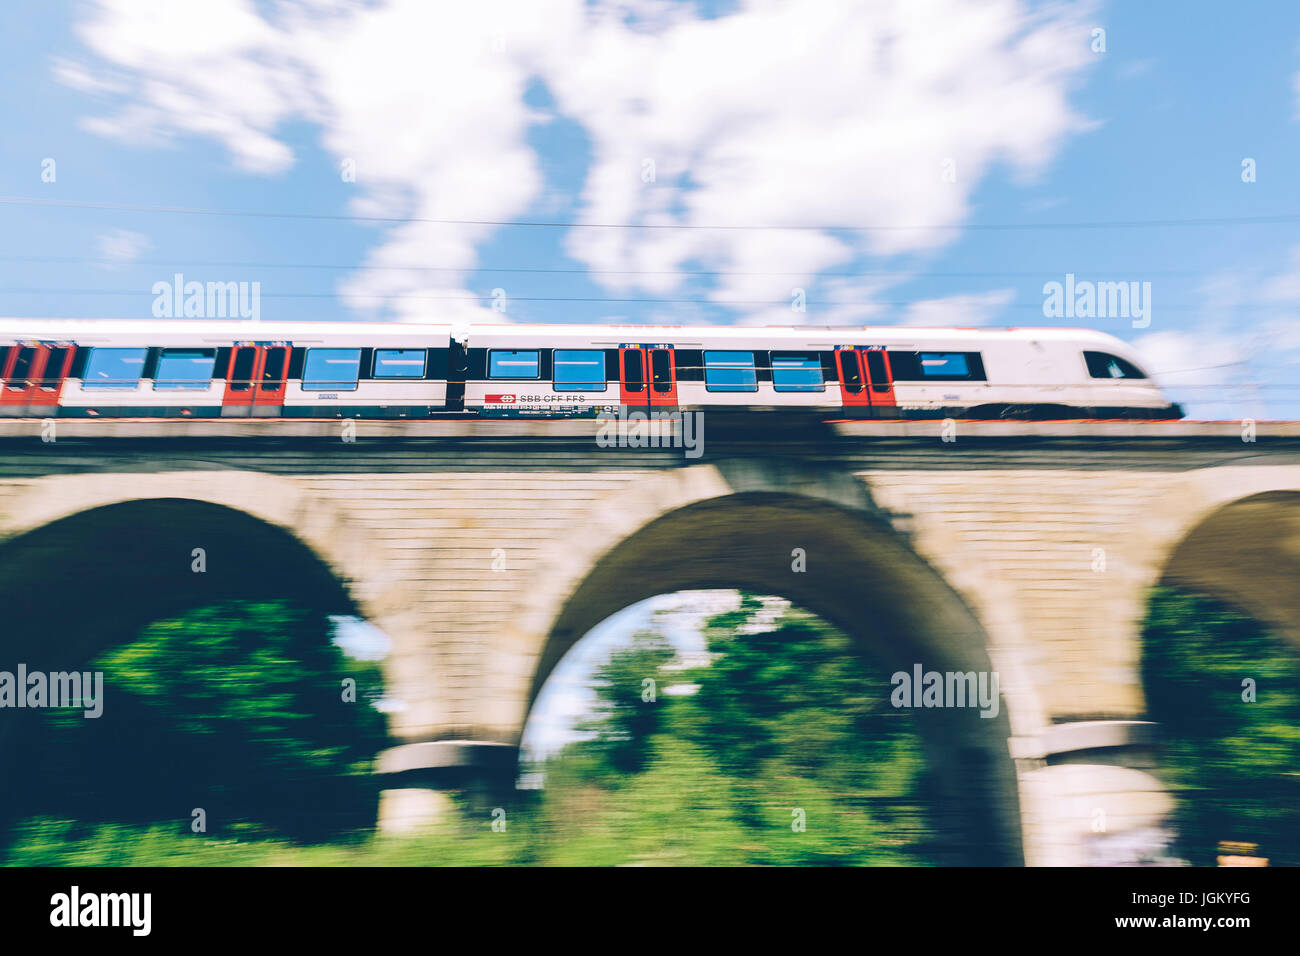 Geneva, Switzerland - June 25, 2017: Swiss regional train passing over a bridge in the Geneva Canton region, with - Stock Image